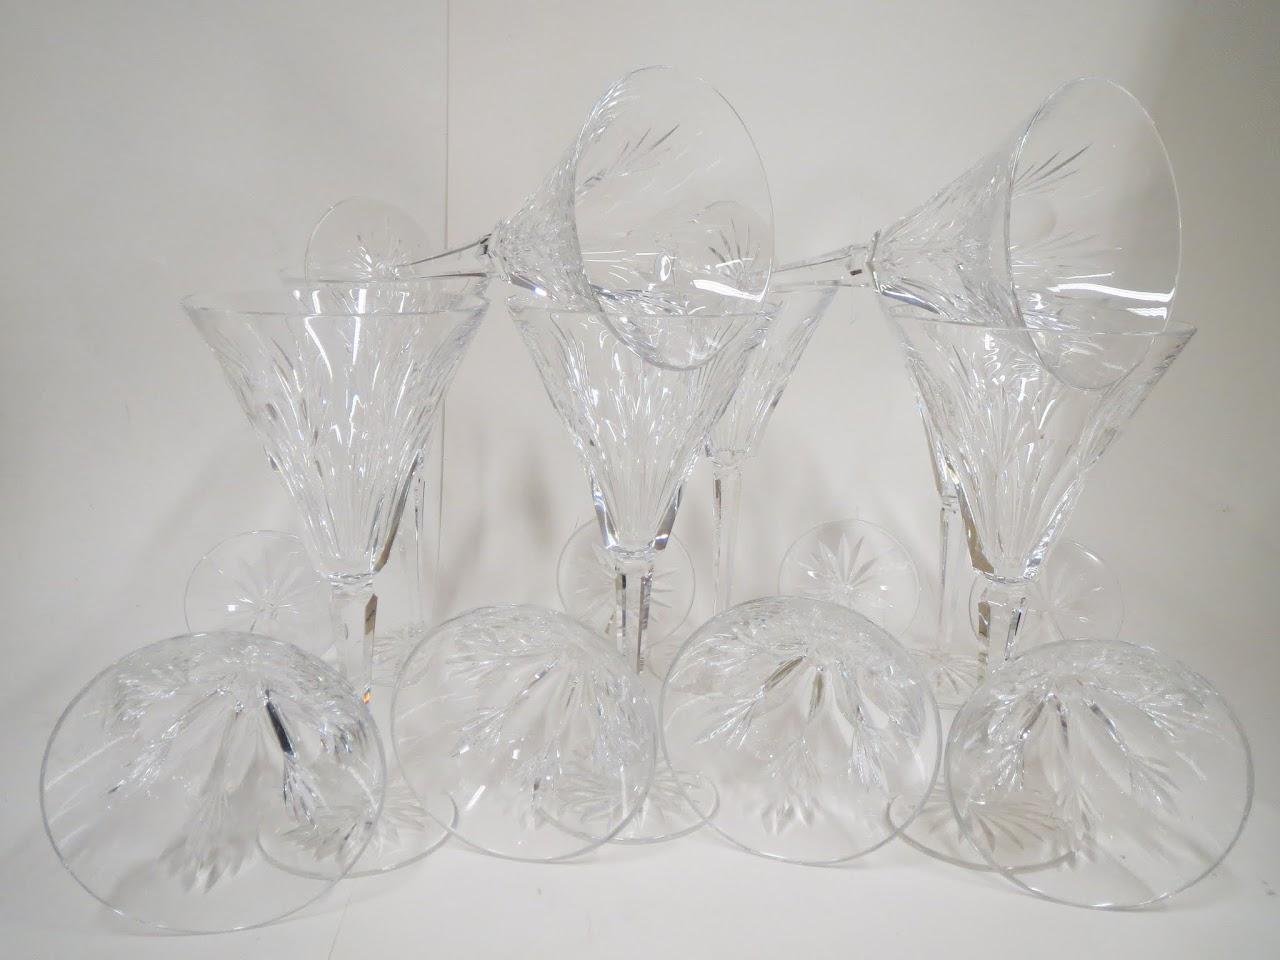 Waterford Crystal Ashleigh Stemware Set of 12